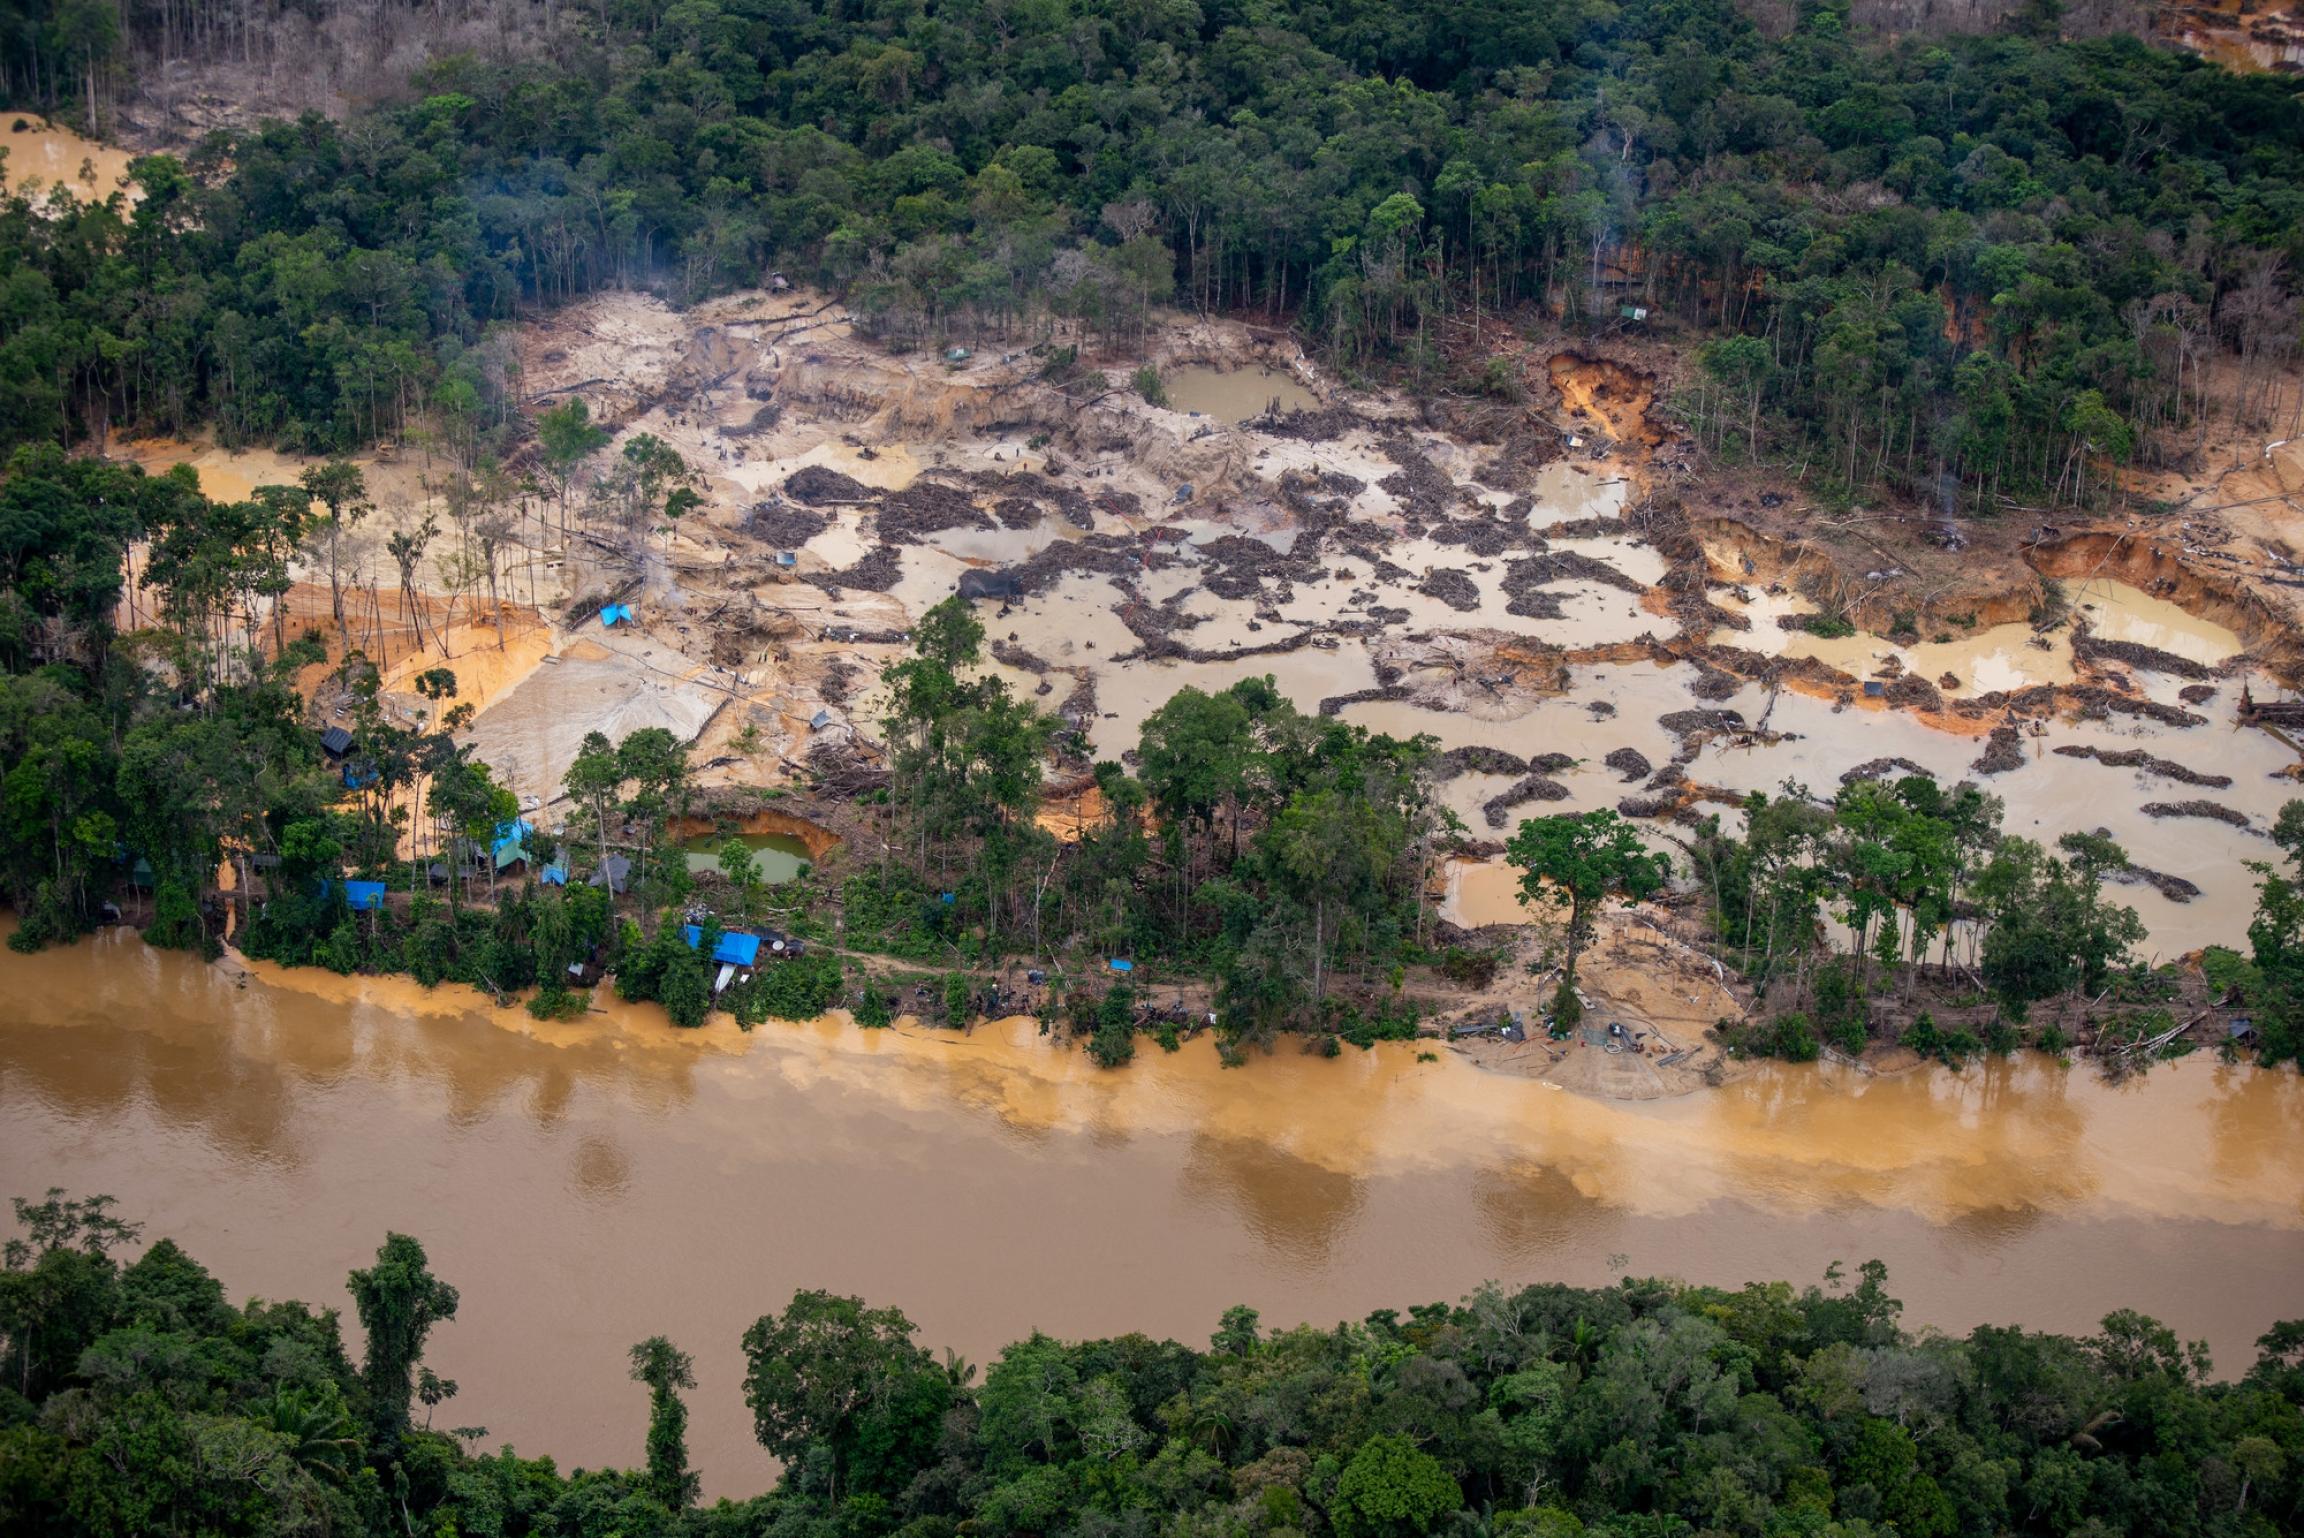 Wildcat mining along the Uraricoera River, in Yanomami Territory.